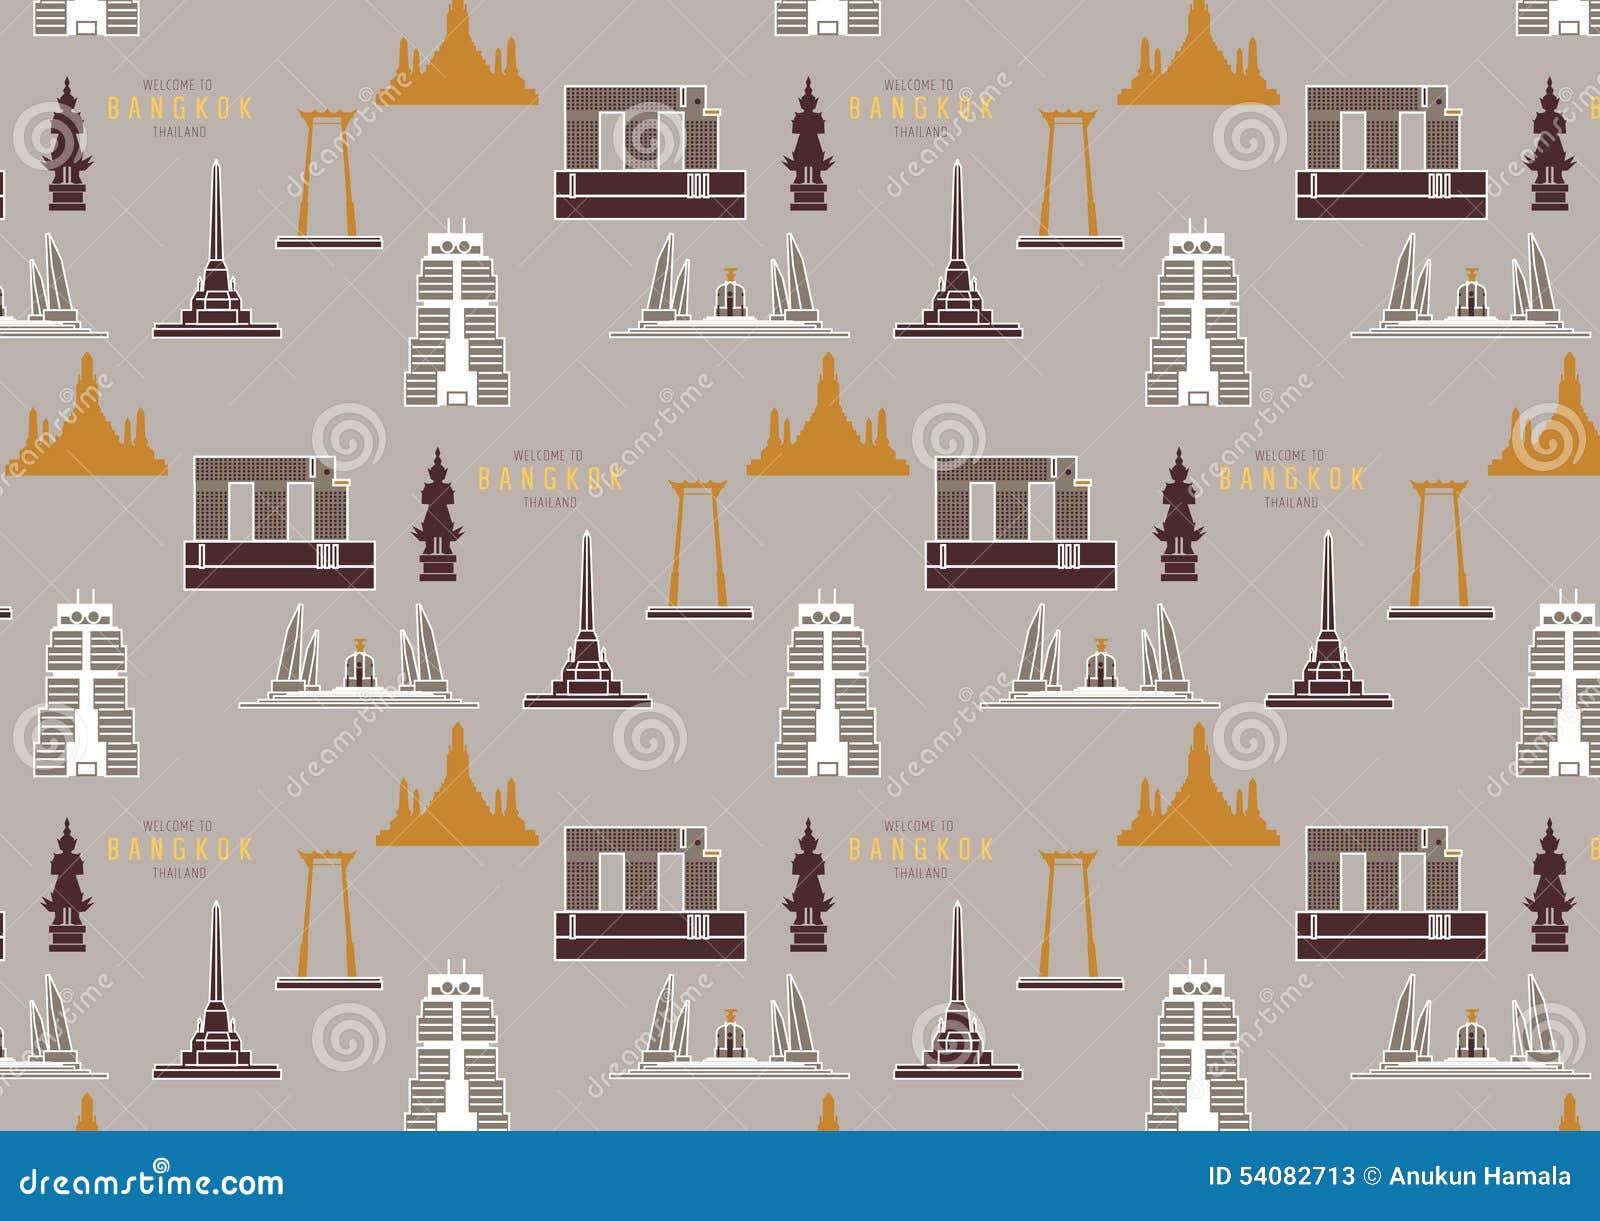 De stadspatroon van Bangkok Thailand